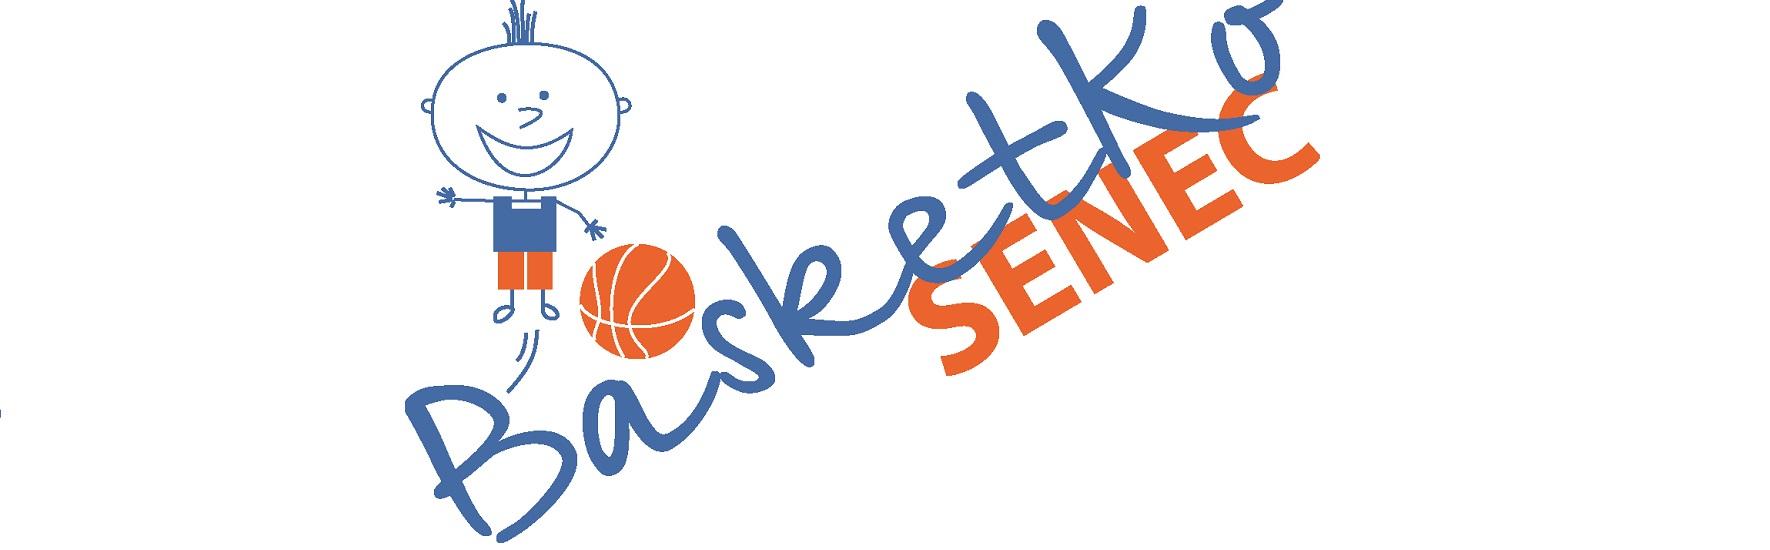 BasketKo-Senec-OK1